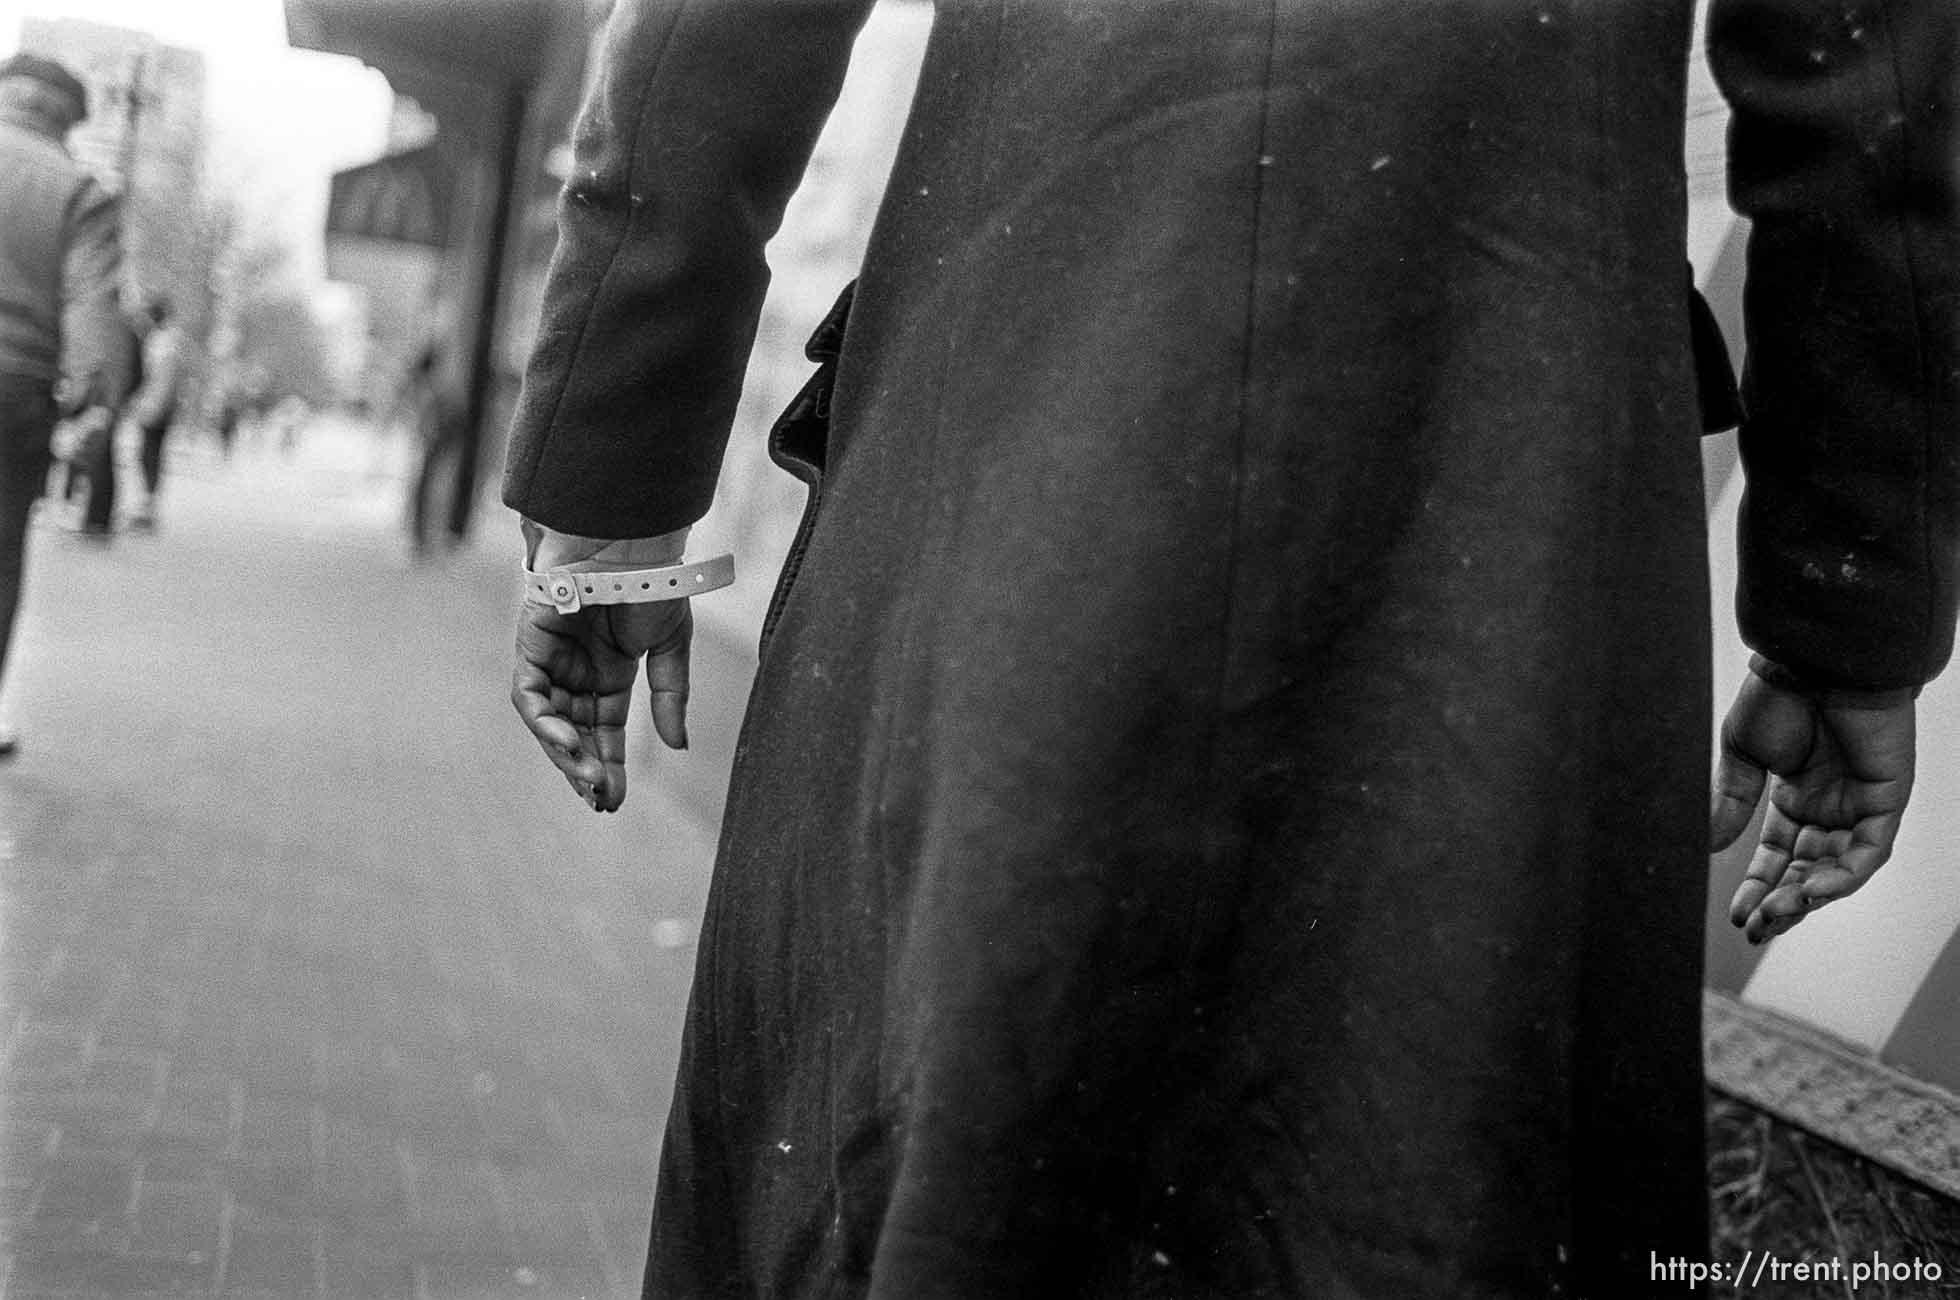 Man with hospital bracelet and long, dark coat